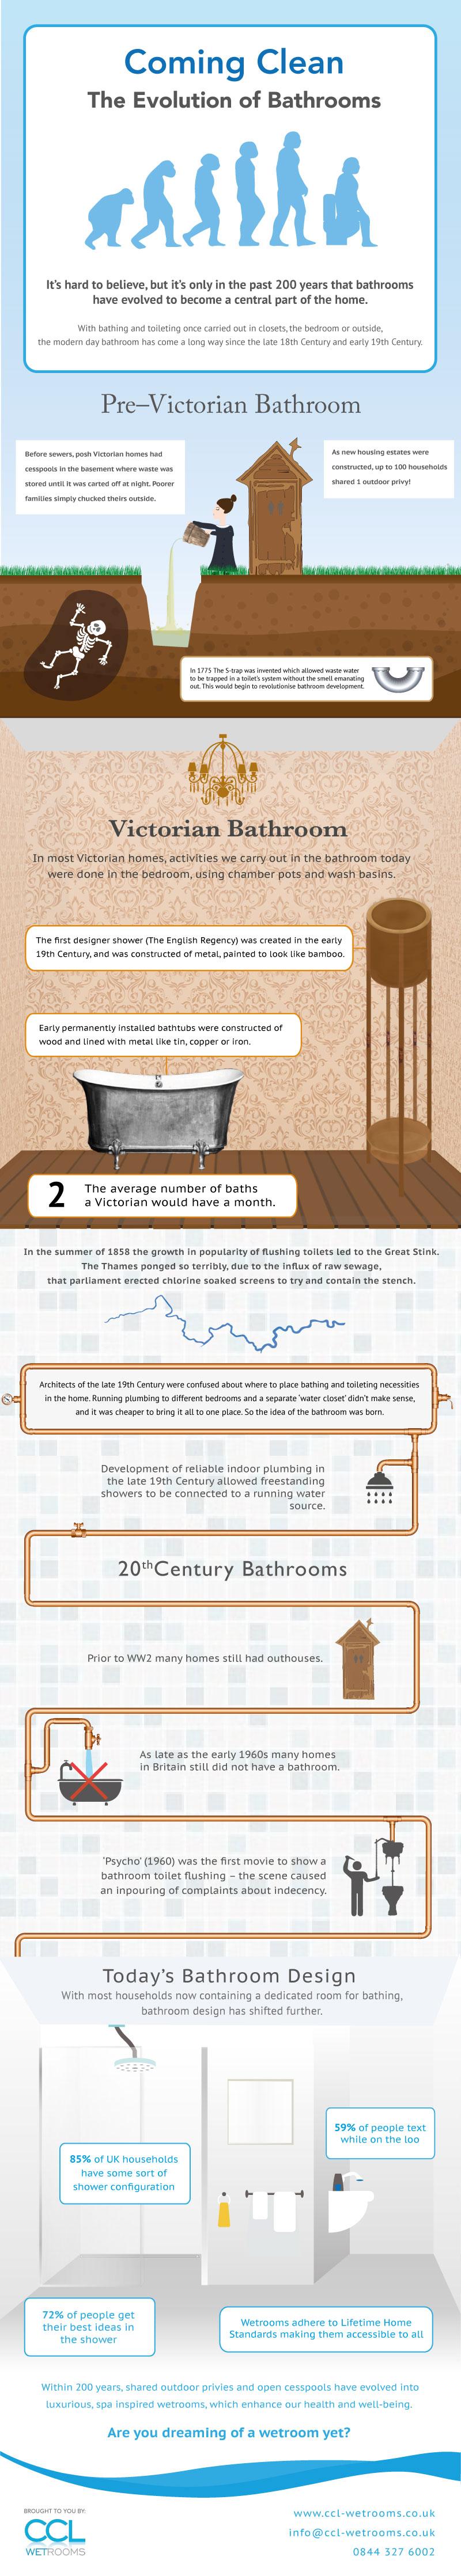 Bathroom Evolution infographic